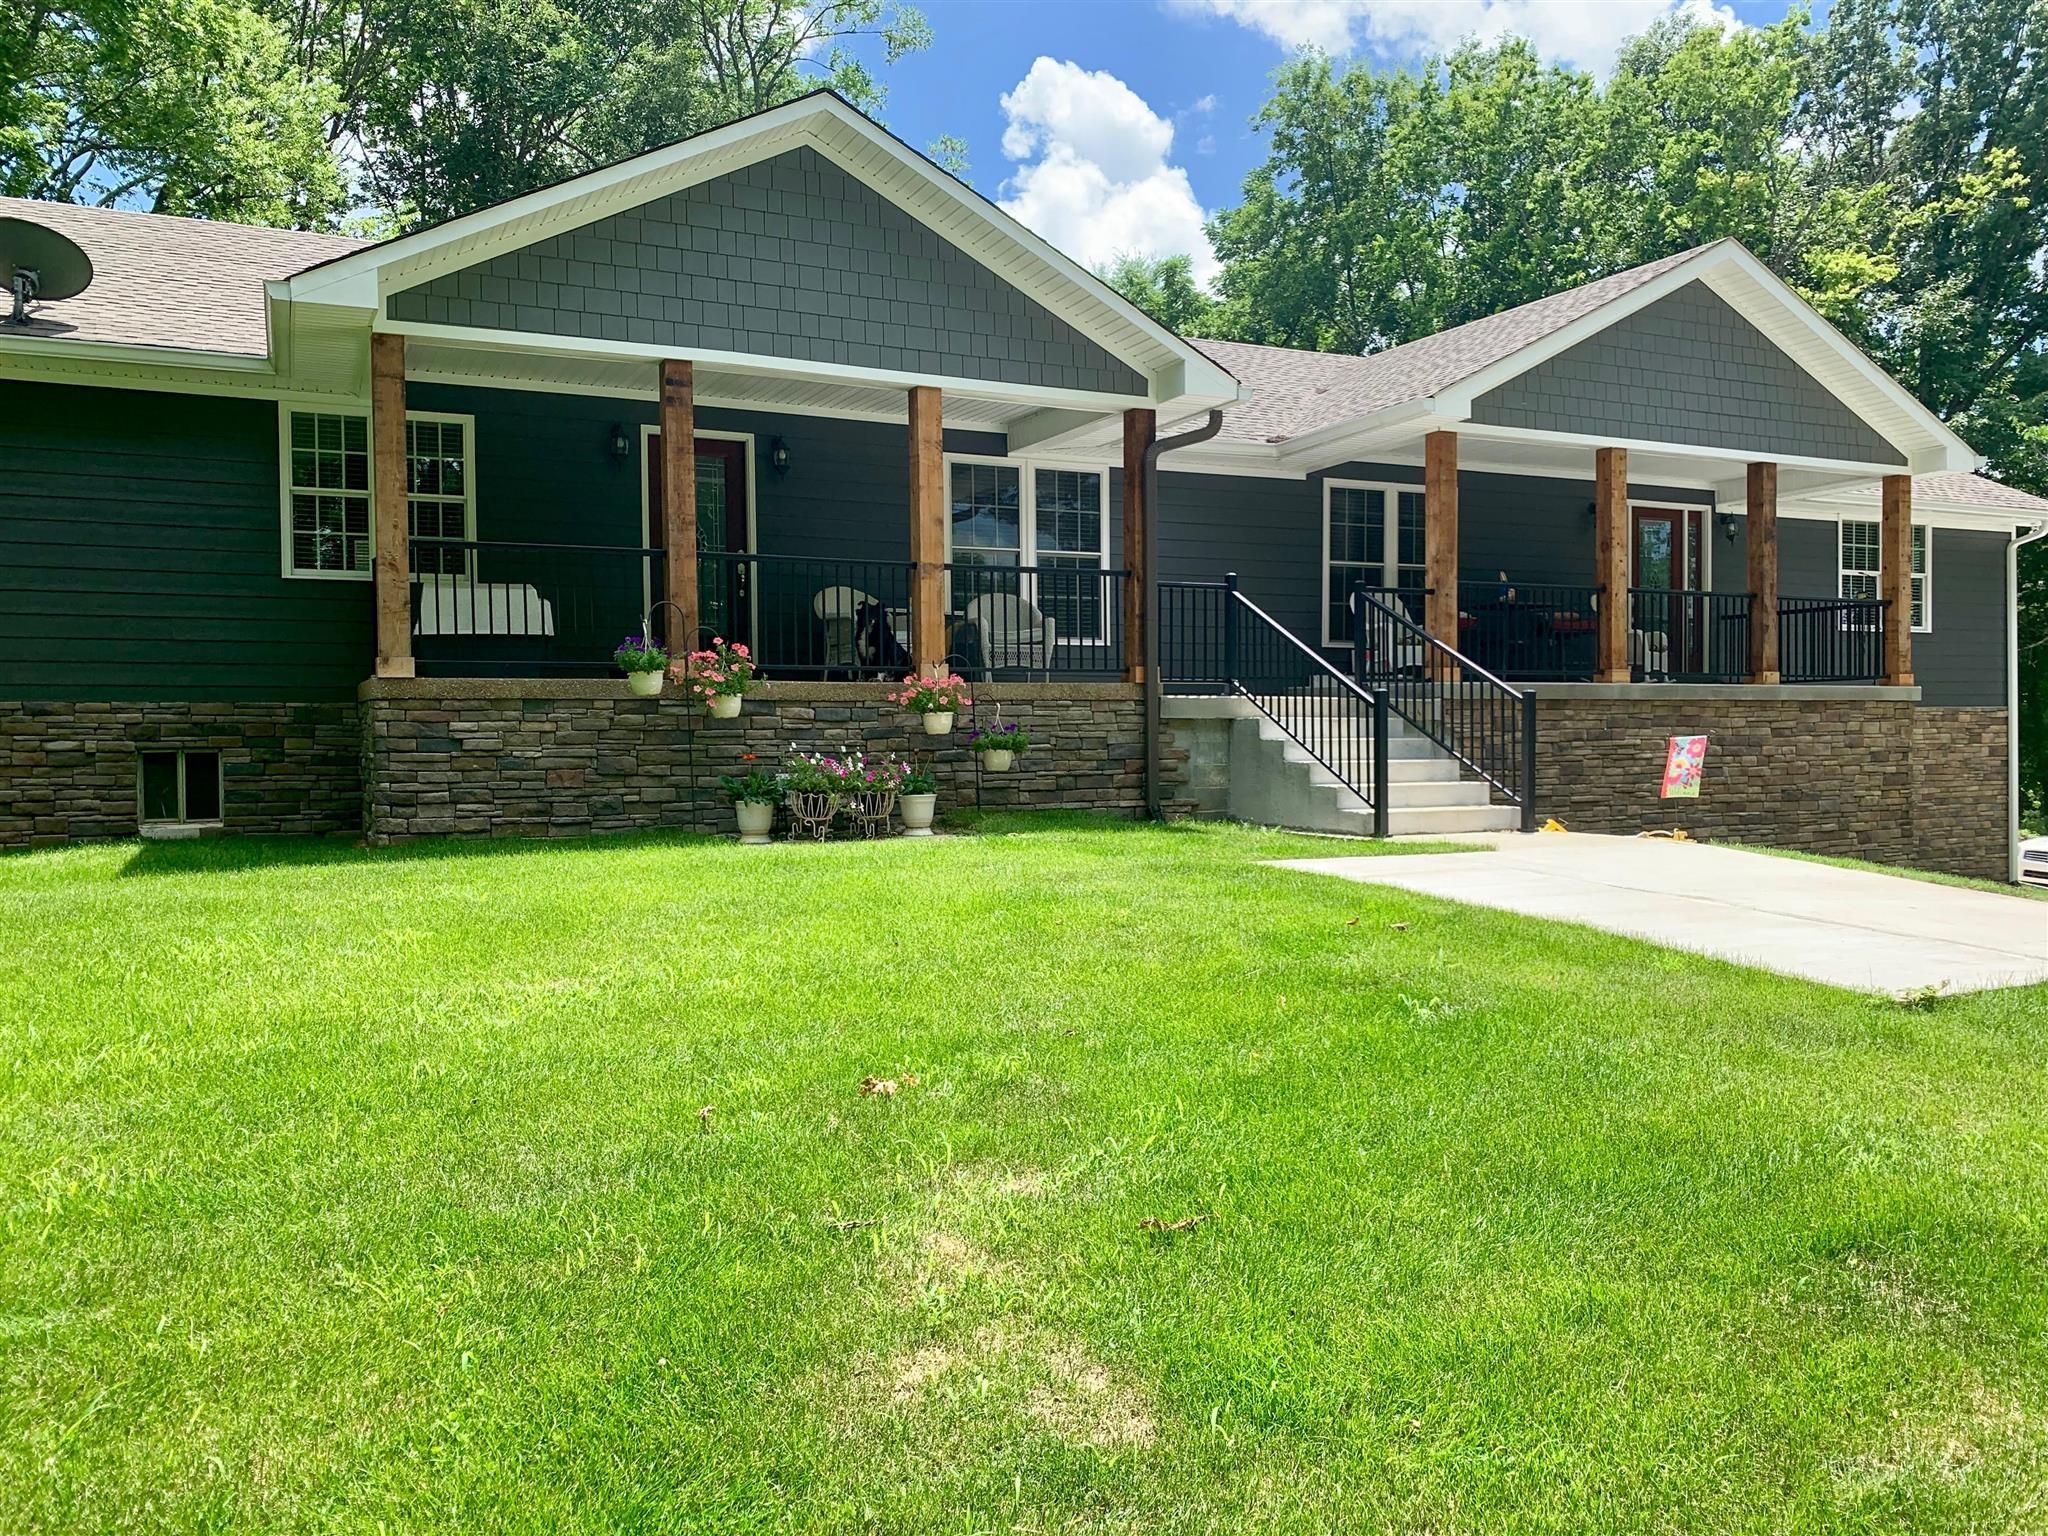 1527 Old Belfast Rd, Lewisburg, TN 37091 - Lewisburg, TN real estate listing